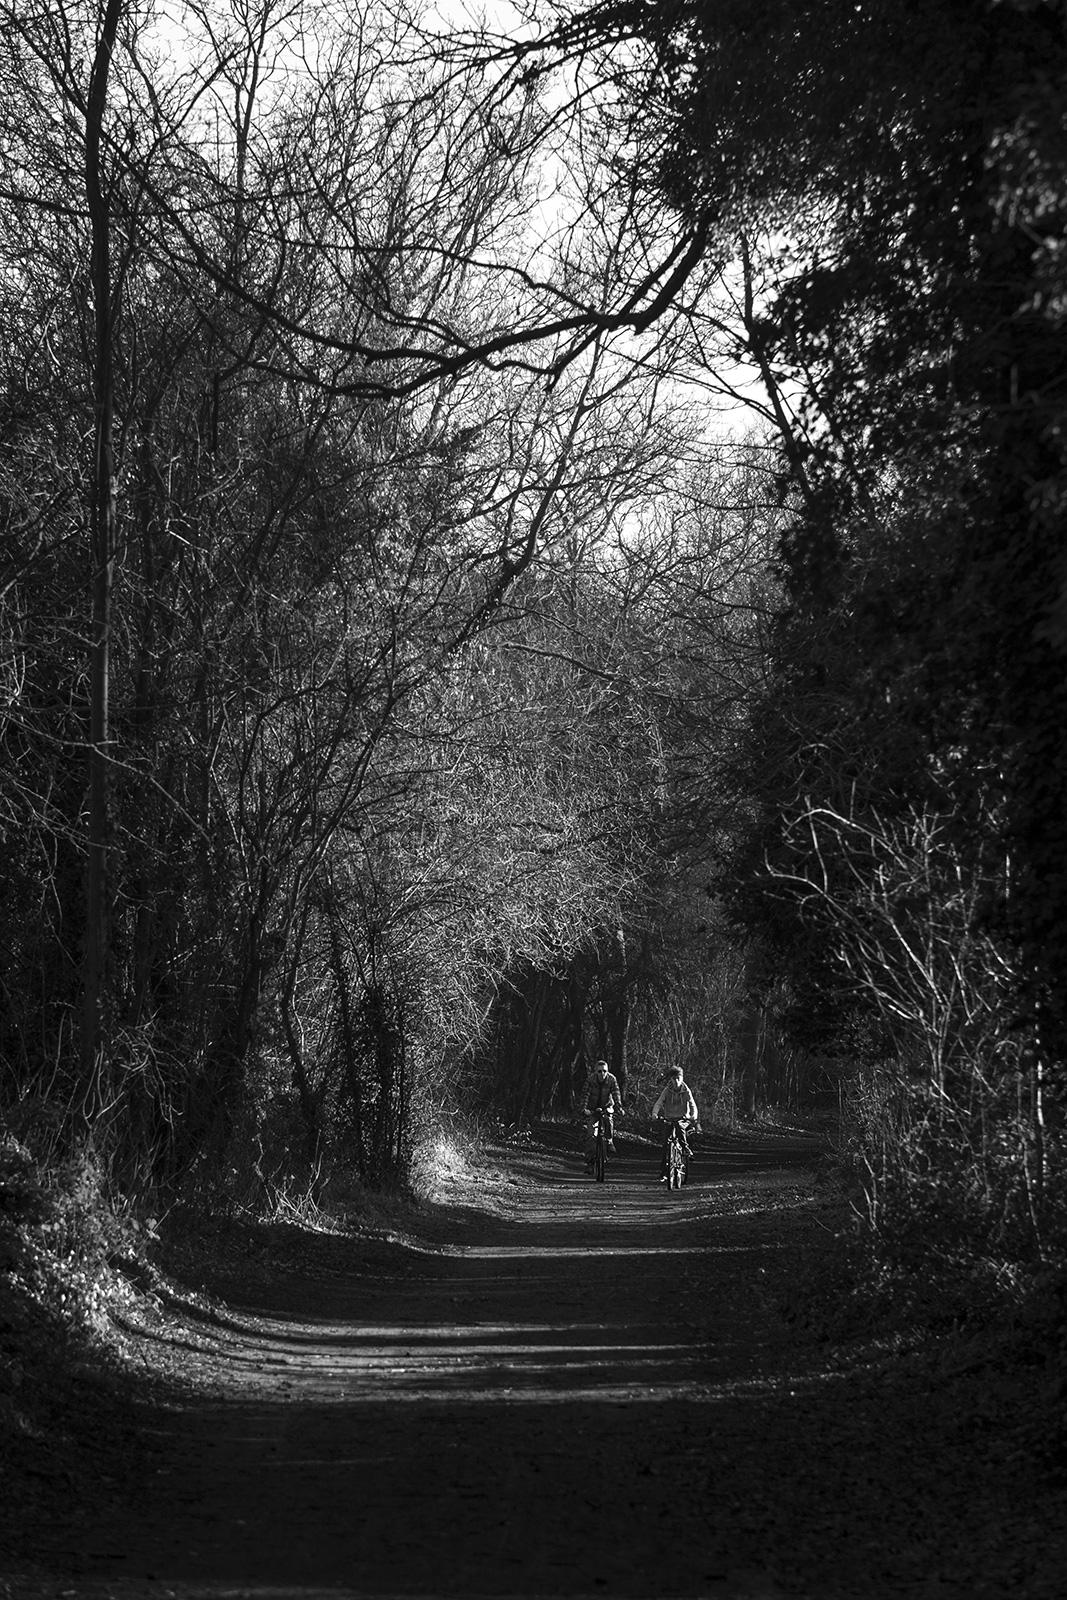 View of cyclists illuminated by sunlight through trees along Valley Walk near Rdbridge Suffolk UK black and white rural urban landscape portrait ©P. Maton 2019 eyeteeth.net